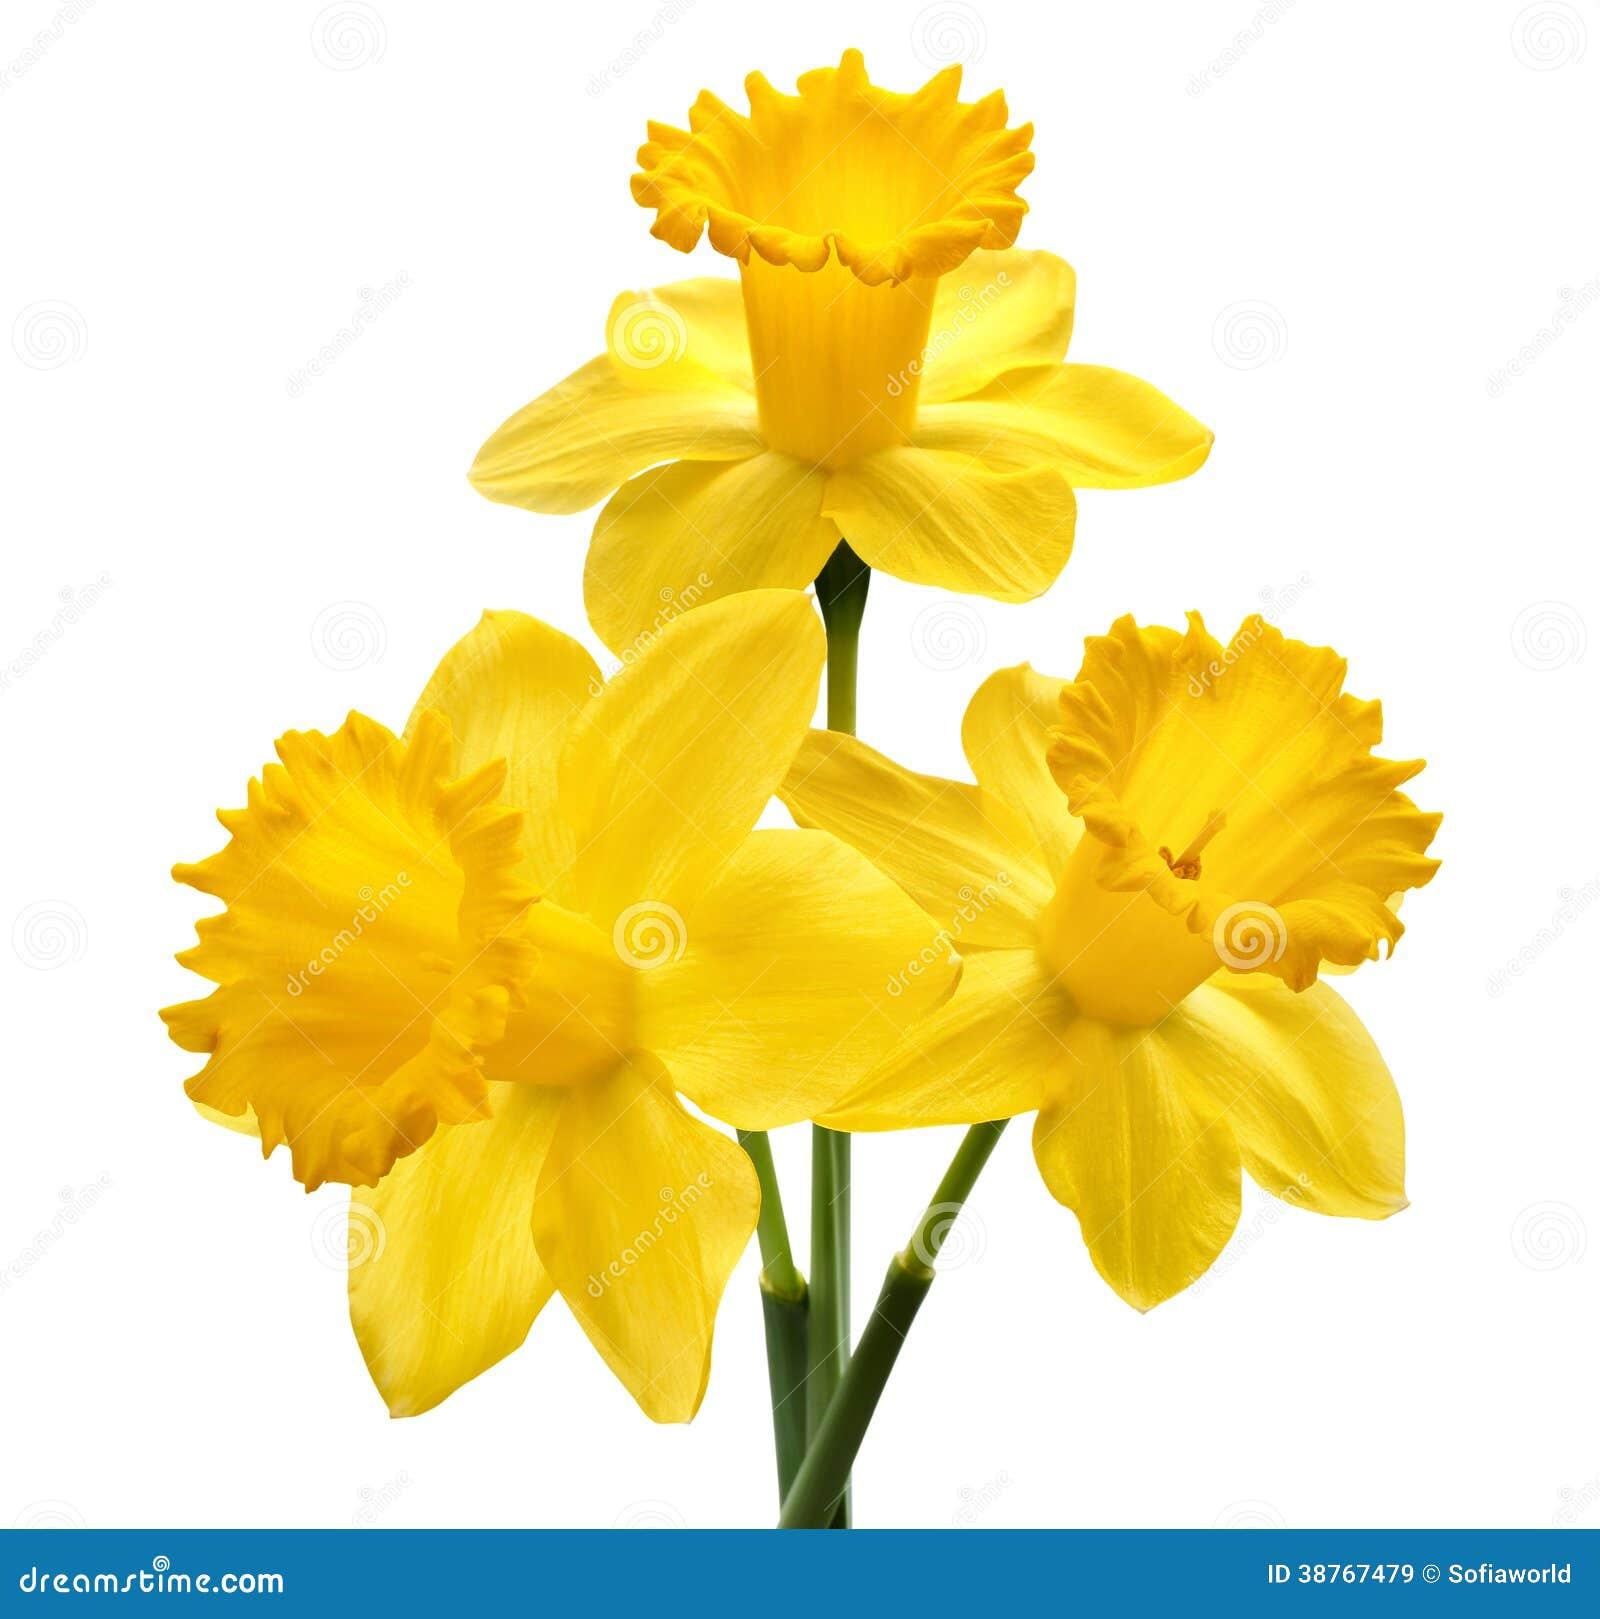 Daffodil Flower Leaf Bloom Pictogram Cartoon Vector